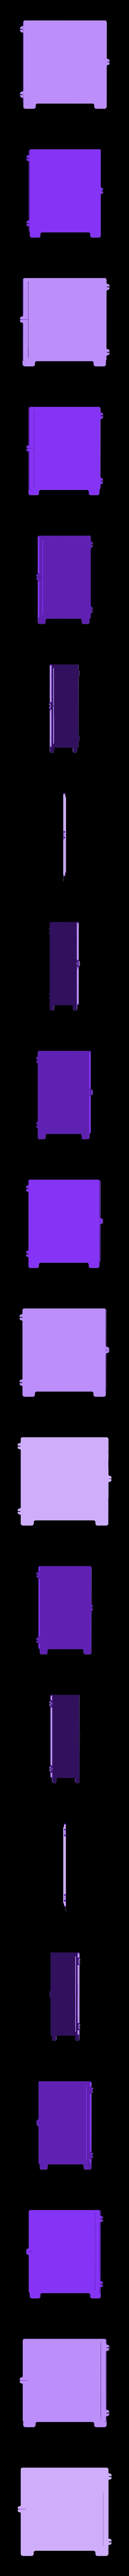 300_ZL_Bed.stl Download free STL file Railcore 300ZL Bed STL for use in Slicers • Model to 3D print, Dsk